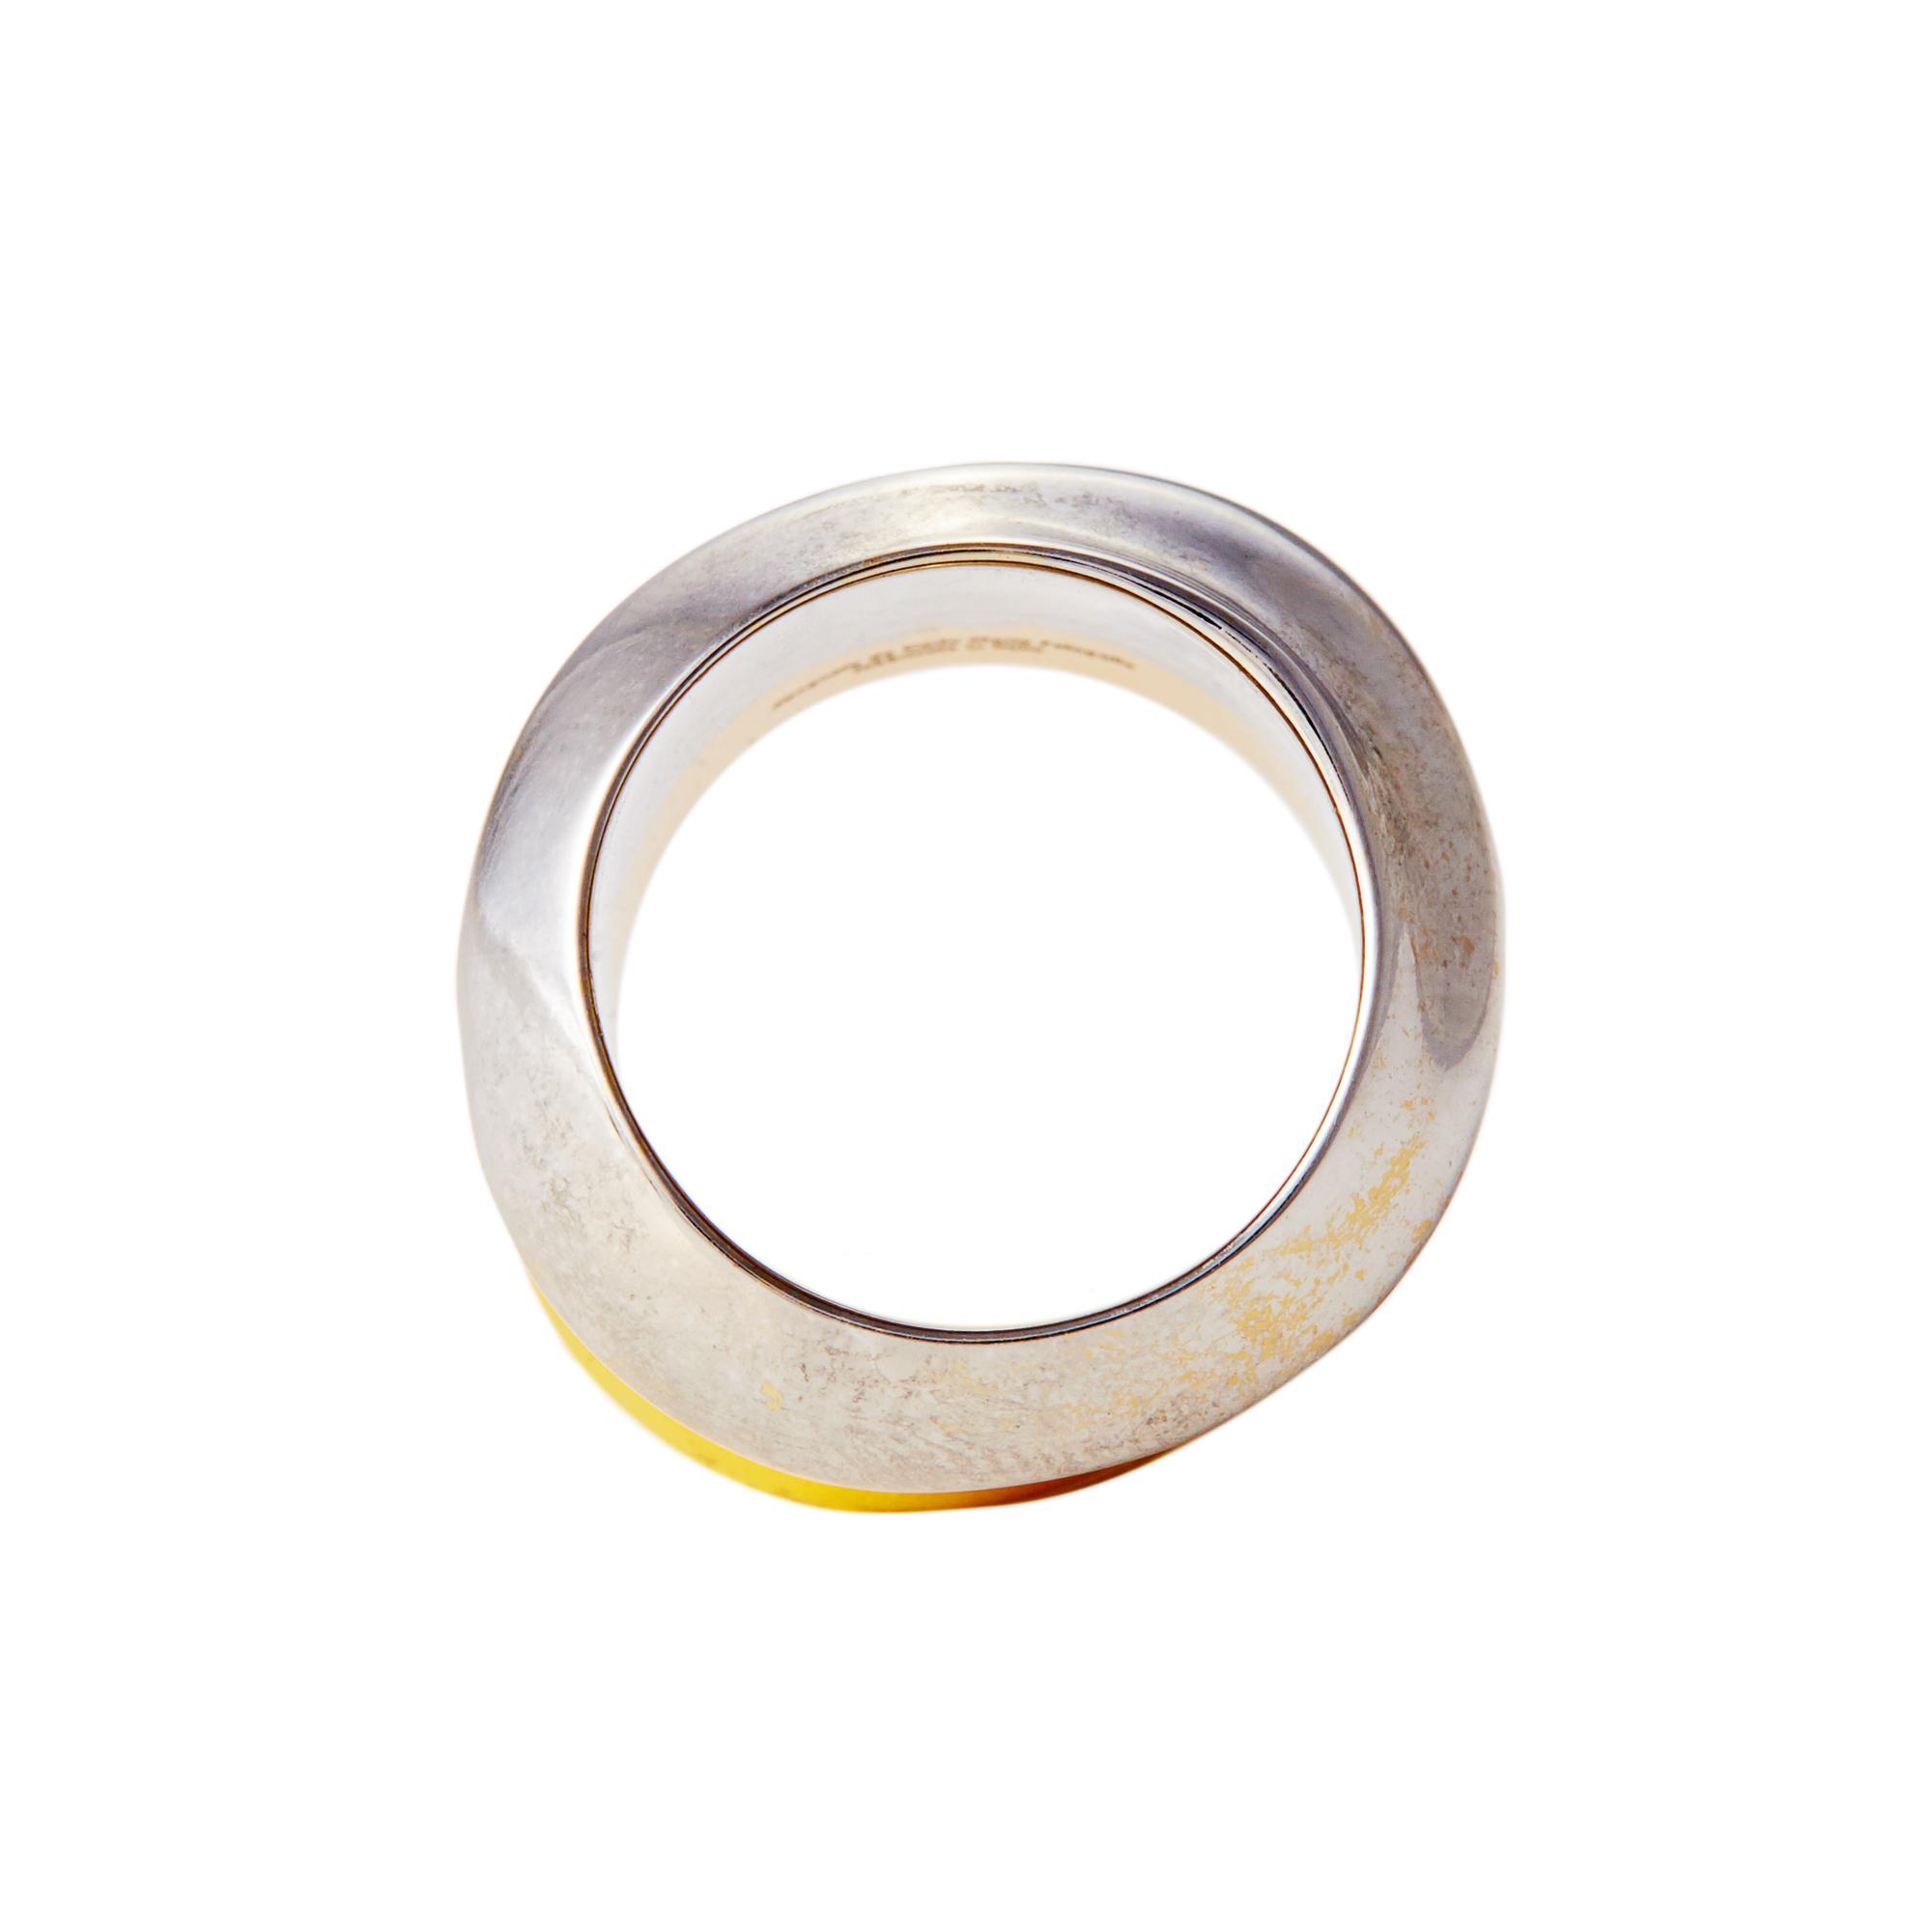 tic_ring_gold_silver_1.jpg